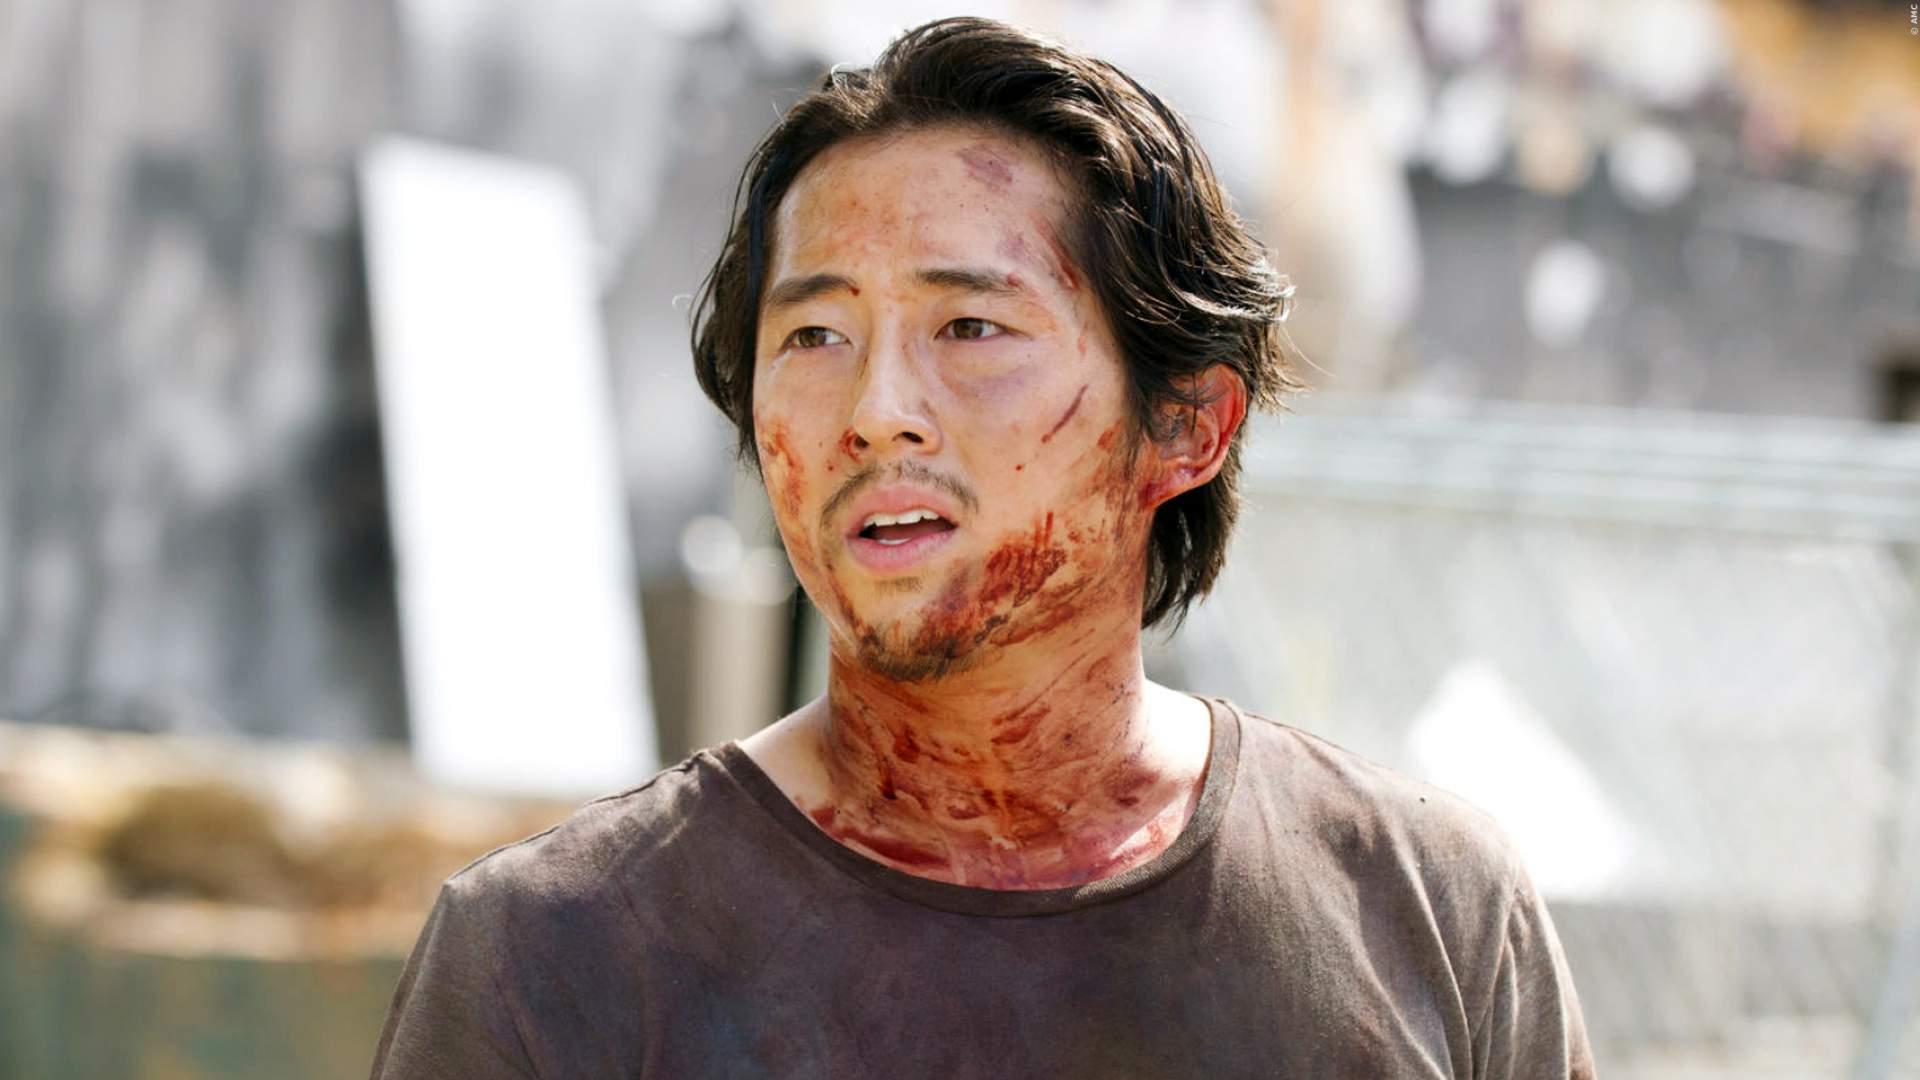 HEIMKINO: Unheimlicher Mystery-Horror mit Steve Yeun aus 'The Walking Dead'